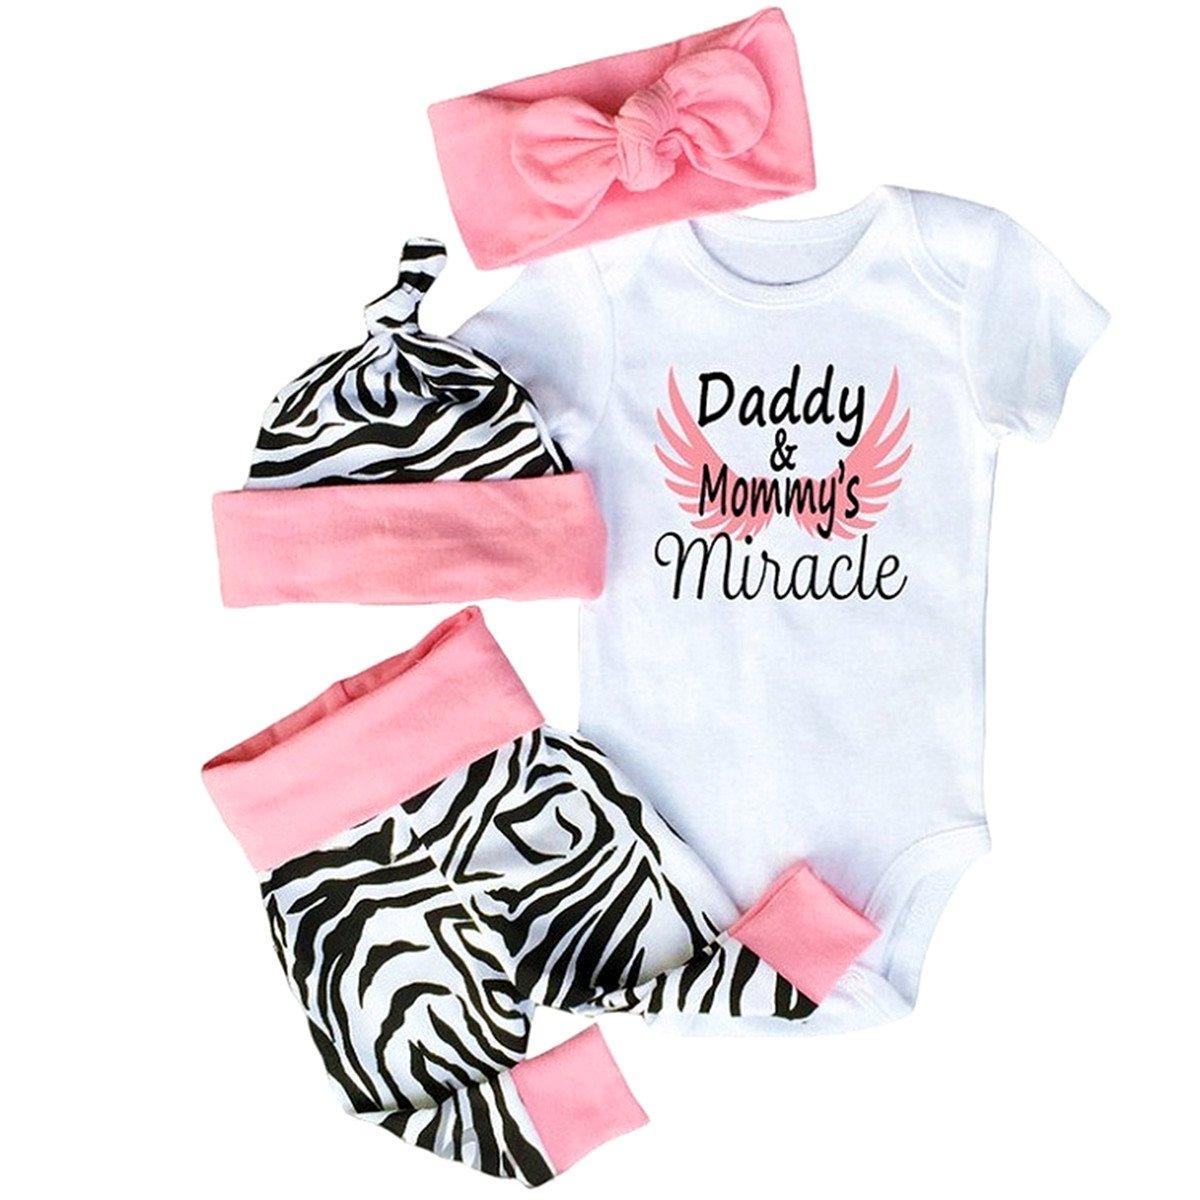 be1e037b6ed9 Amazon.com  WINZIK Newborn Baby Kids Outfits Daddy and Mommy s ...